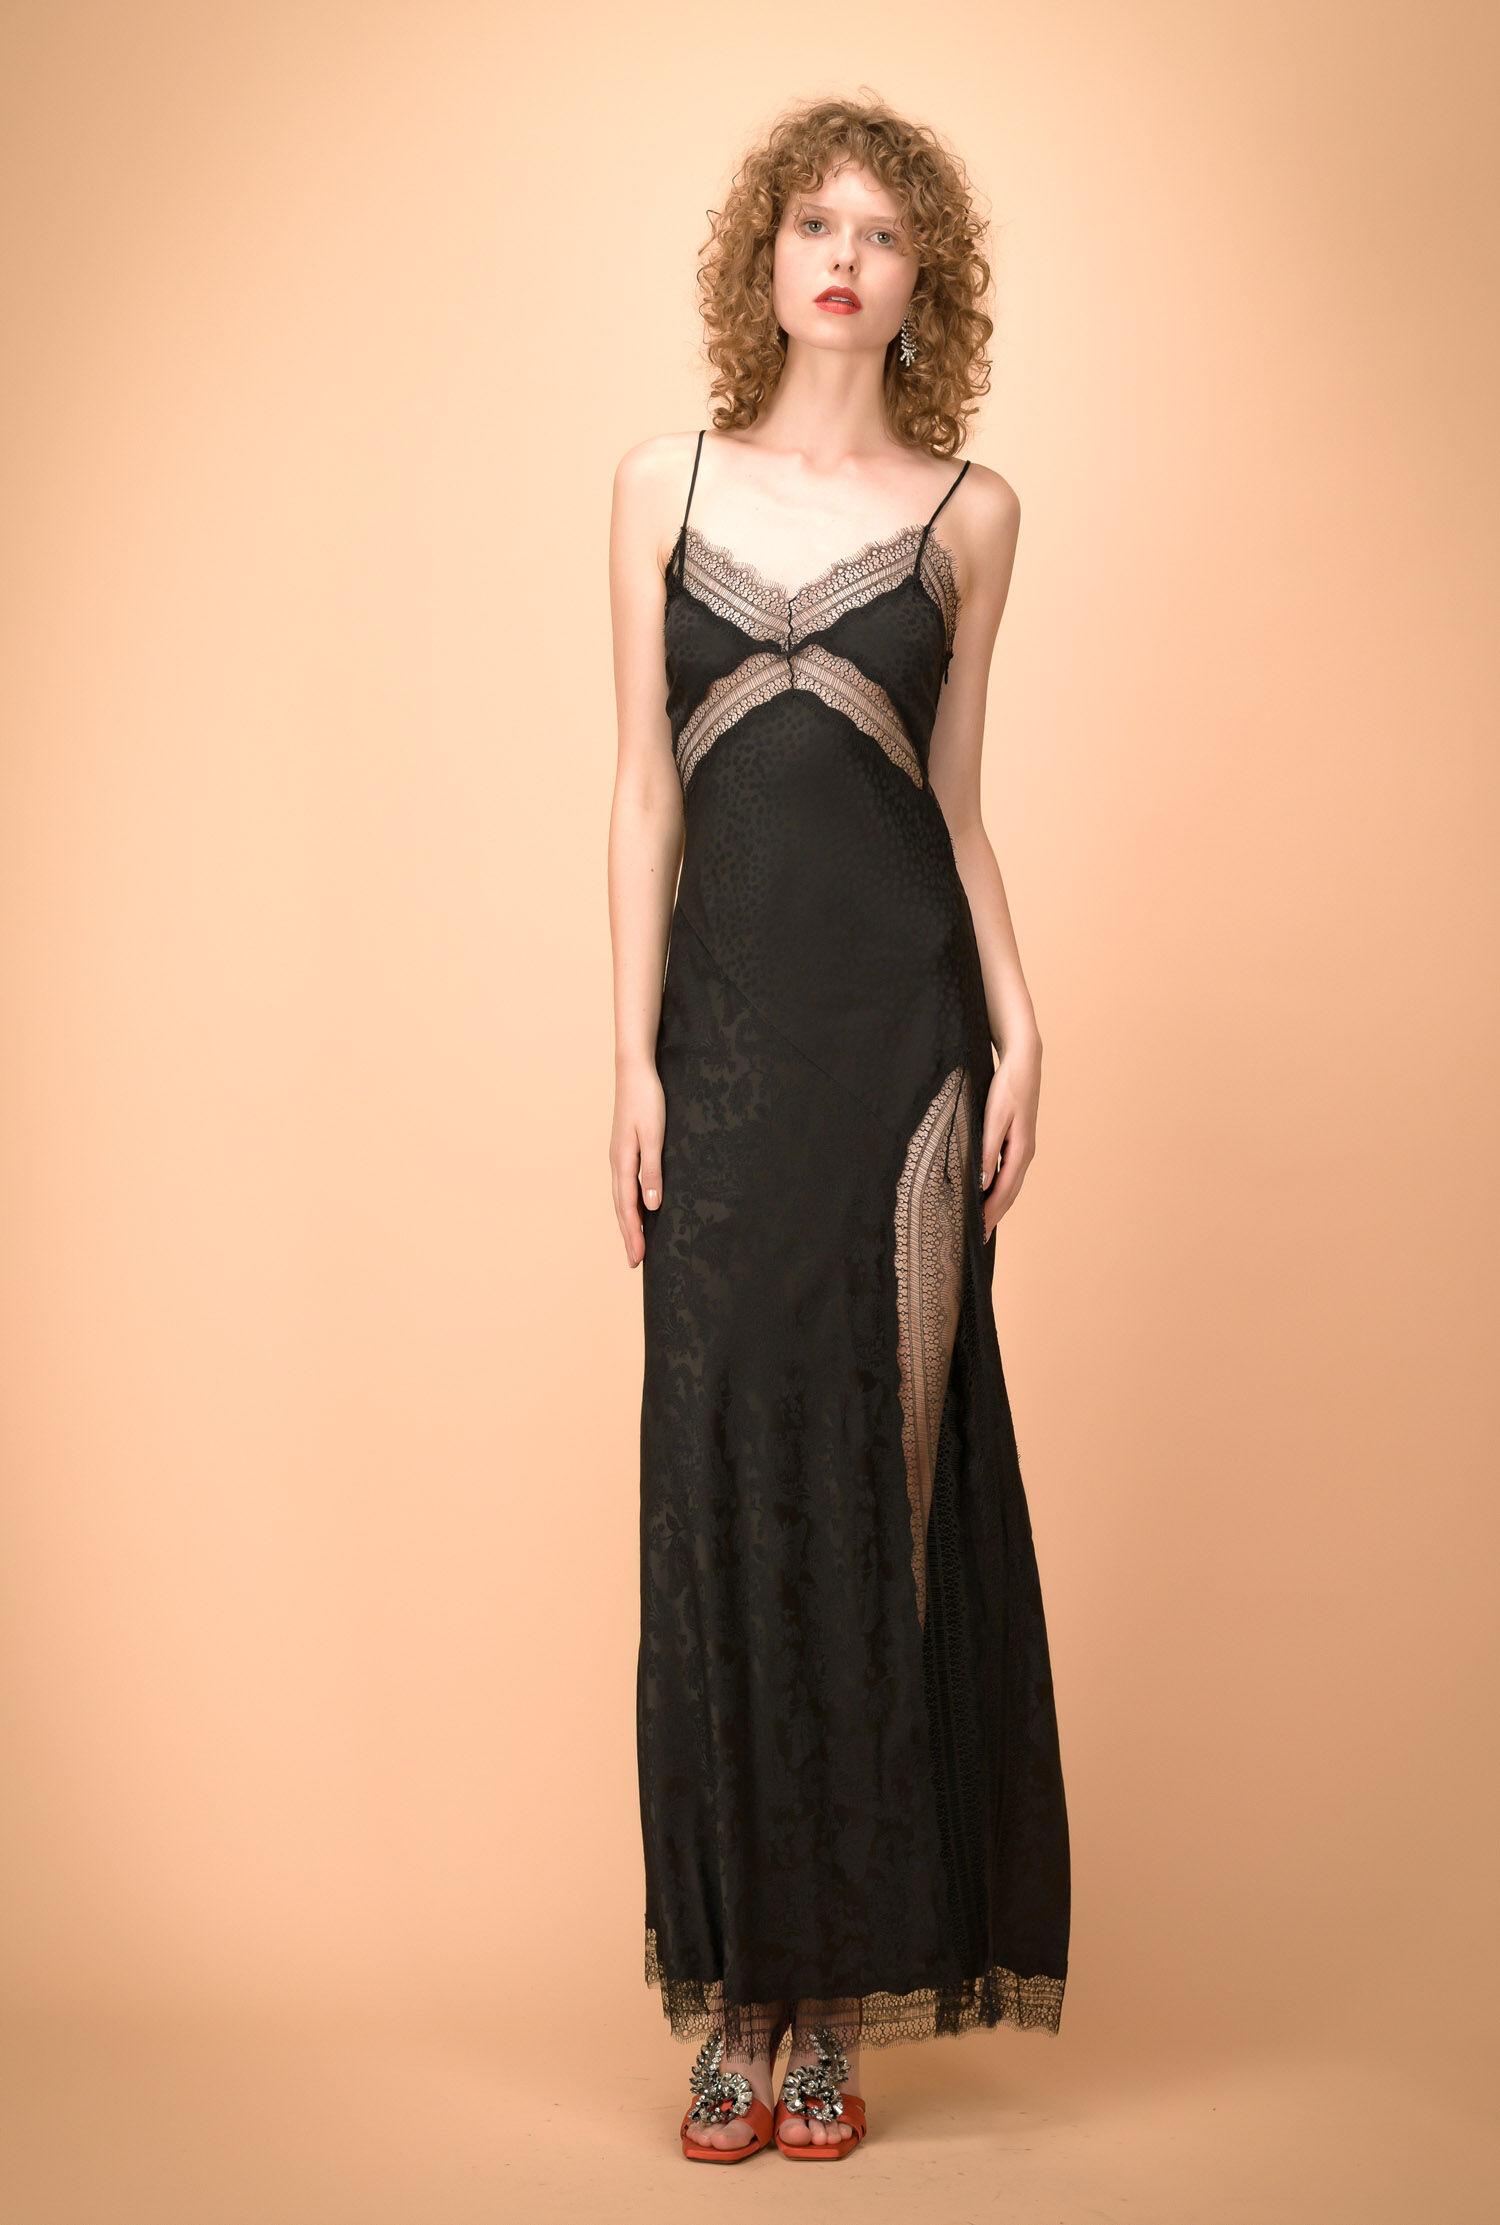 Long Dresses On Sale